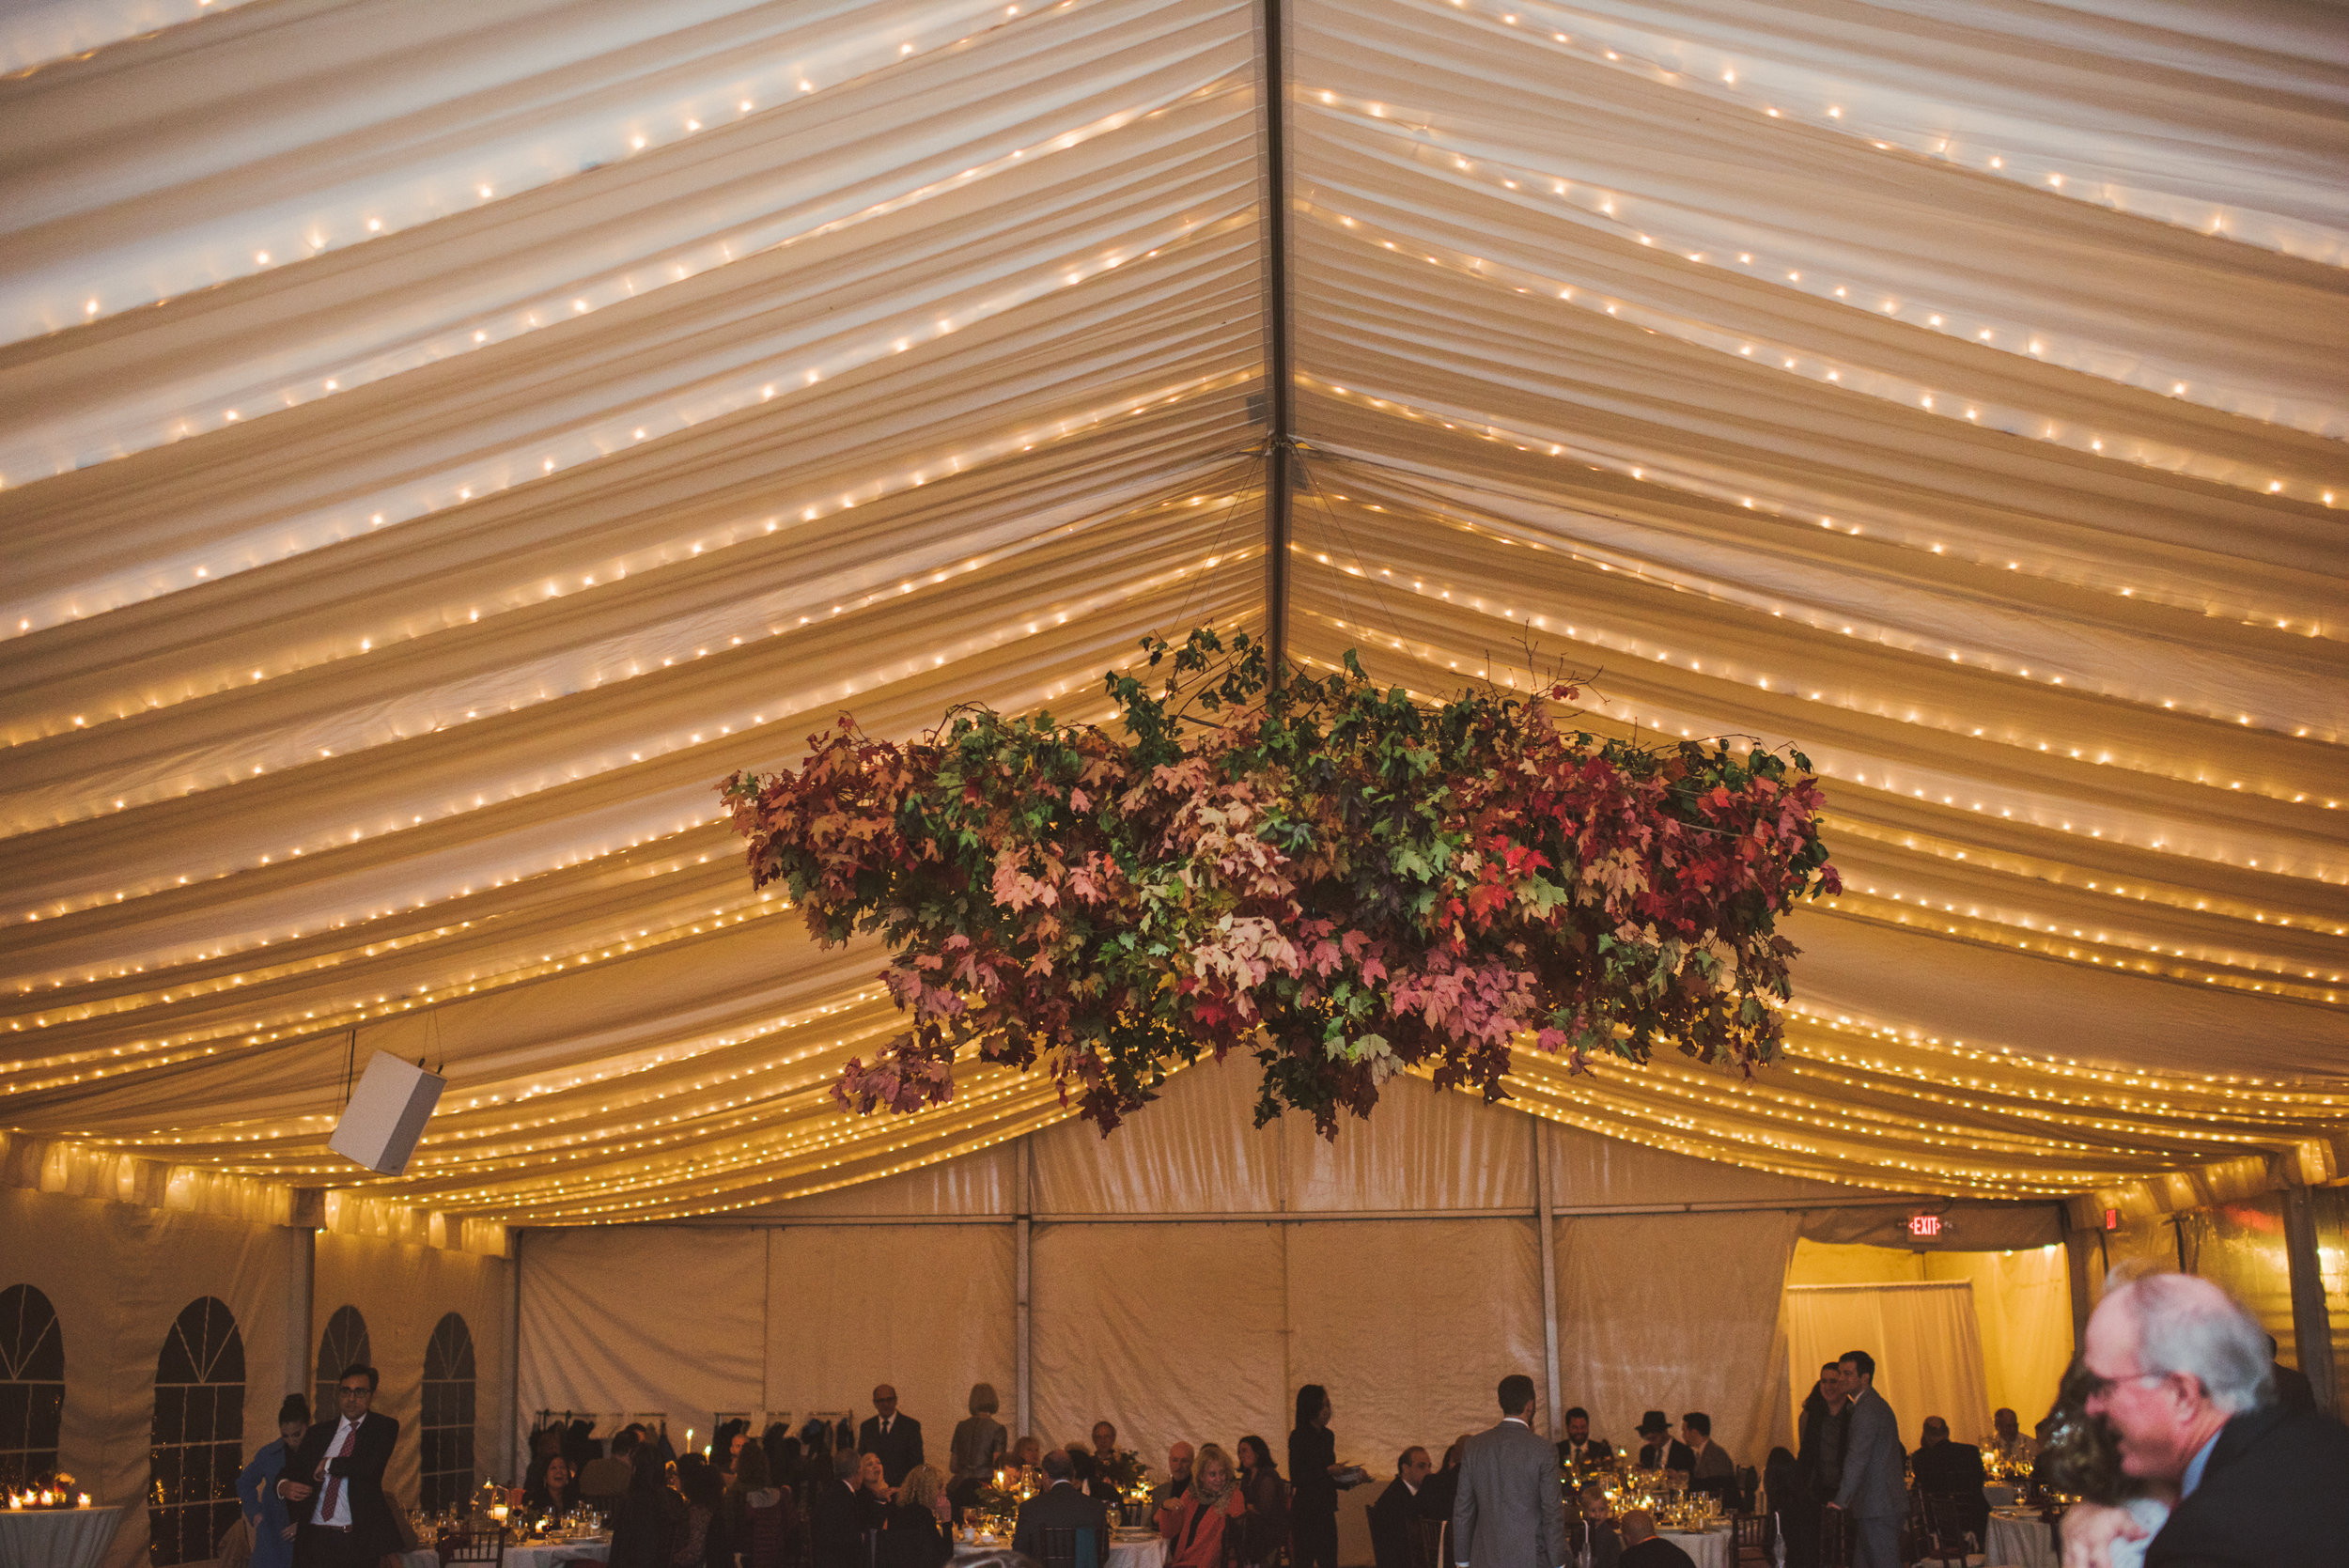 JACQUELINE & ANDREW WARSHAWER -BROOKMILL FARM FALL WEDDING - INTIMATE WEDDING PHOTOGRAPHER - TWOTWENTY by CHI-CHI AGBIM-536.jpg